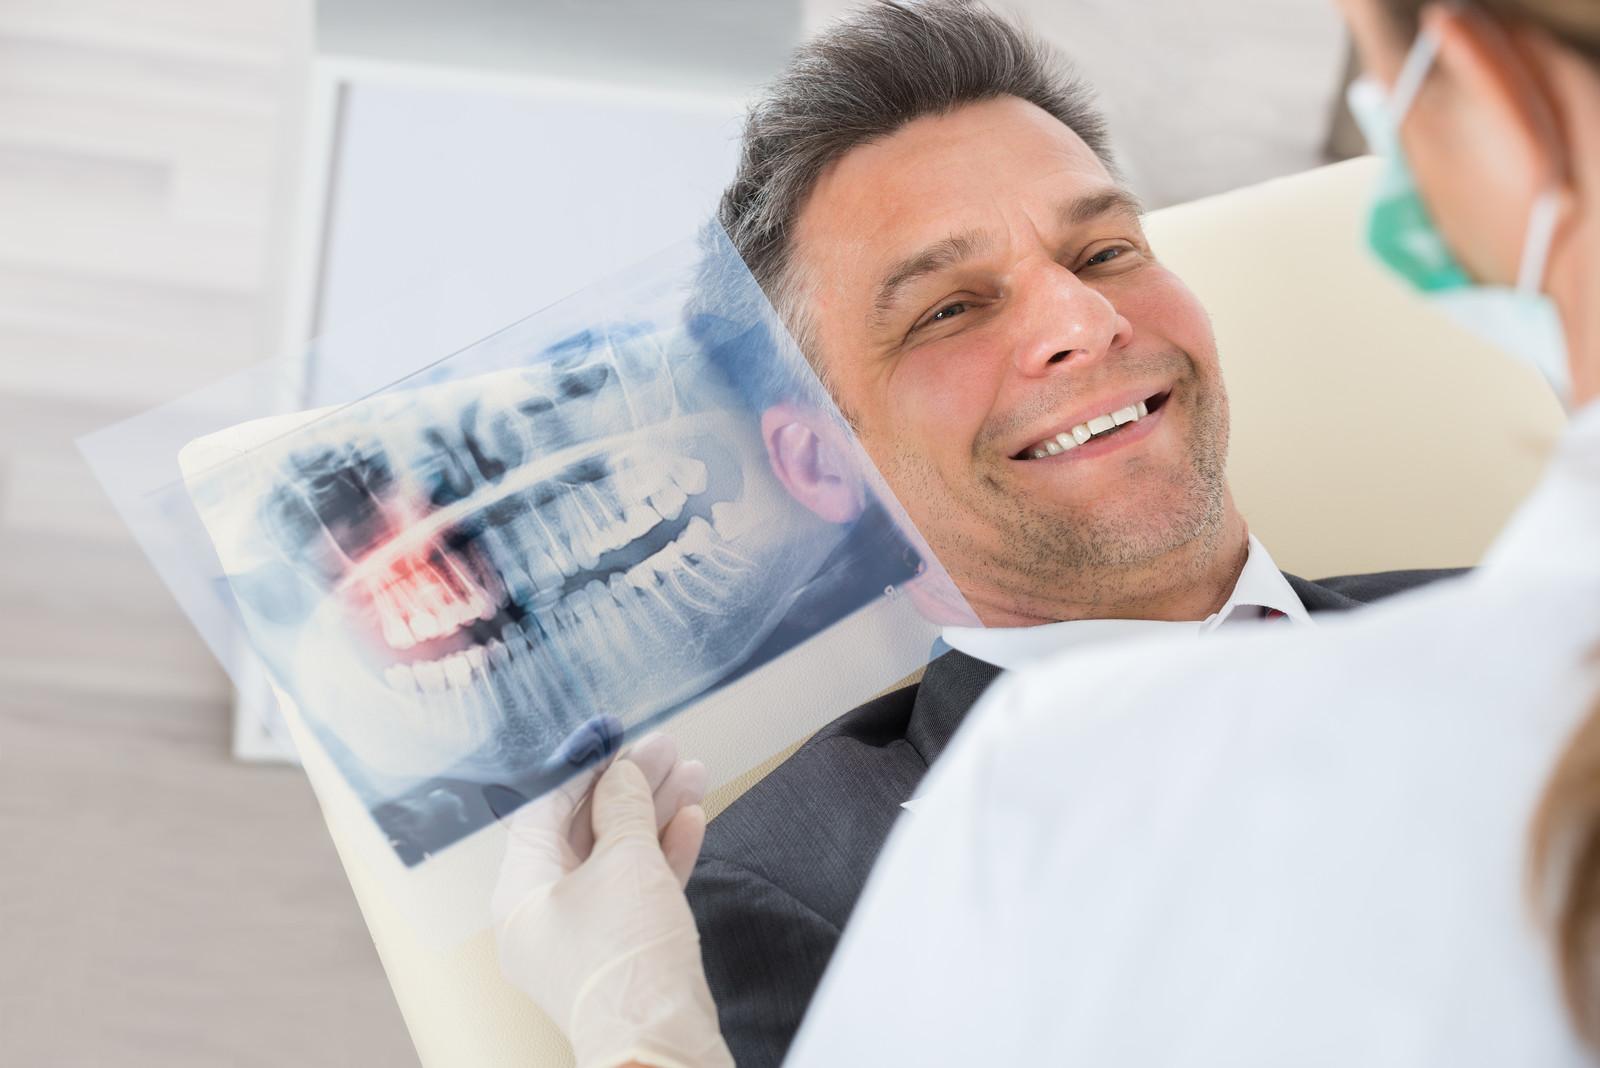 Lesiones dentales - PCM Clínica Dental en Córdoba